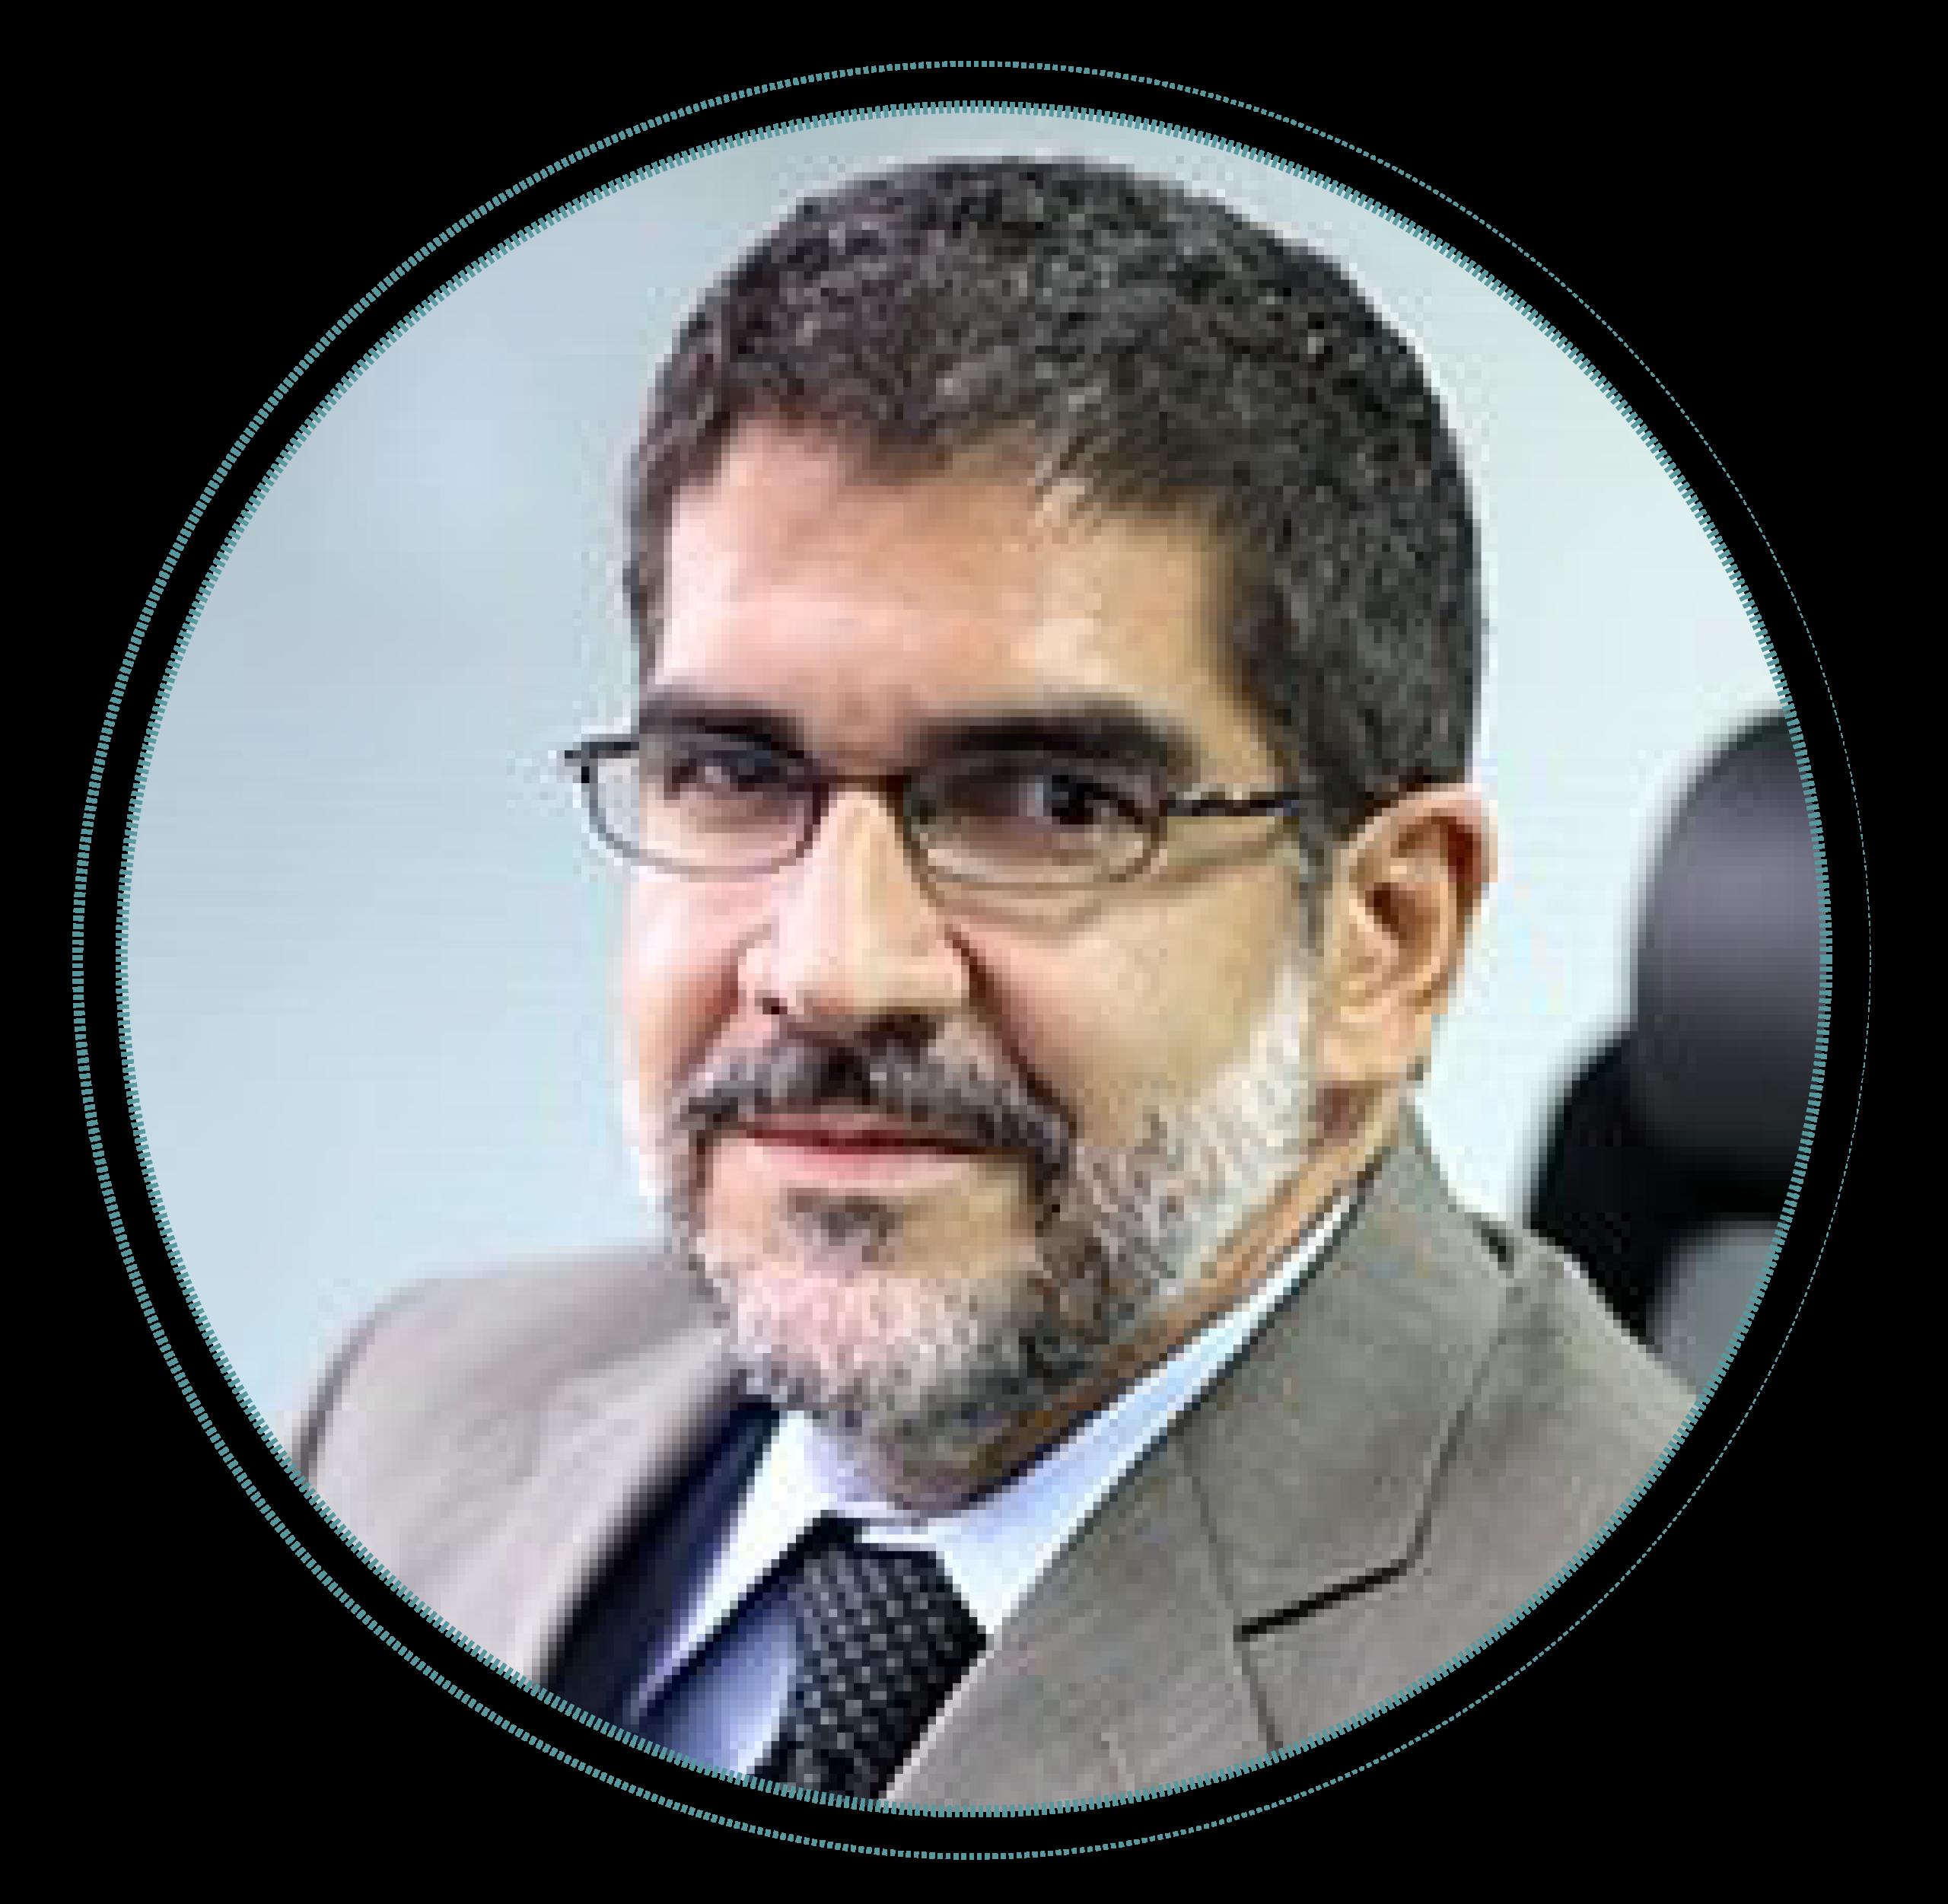 Renato Chaves - Conselho Fiscal